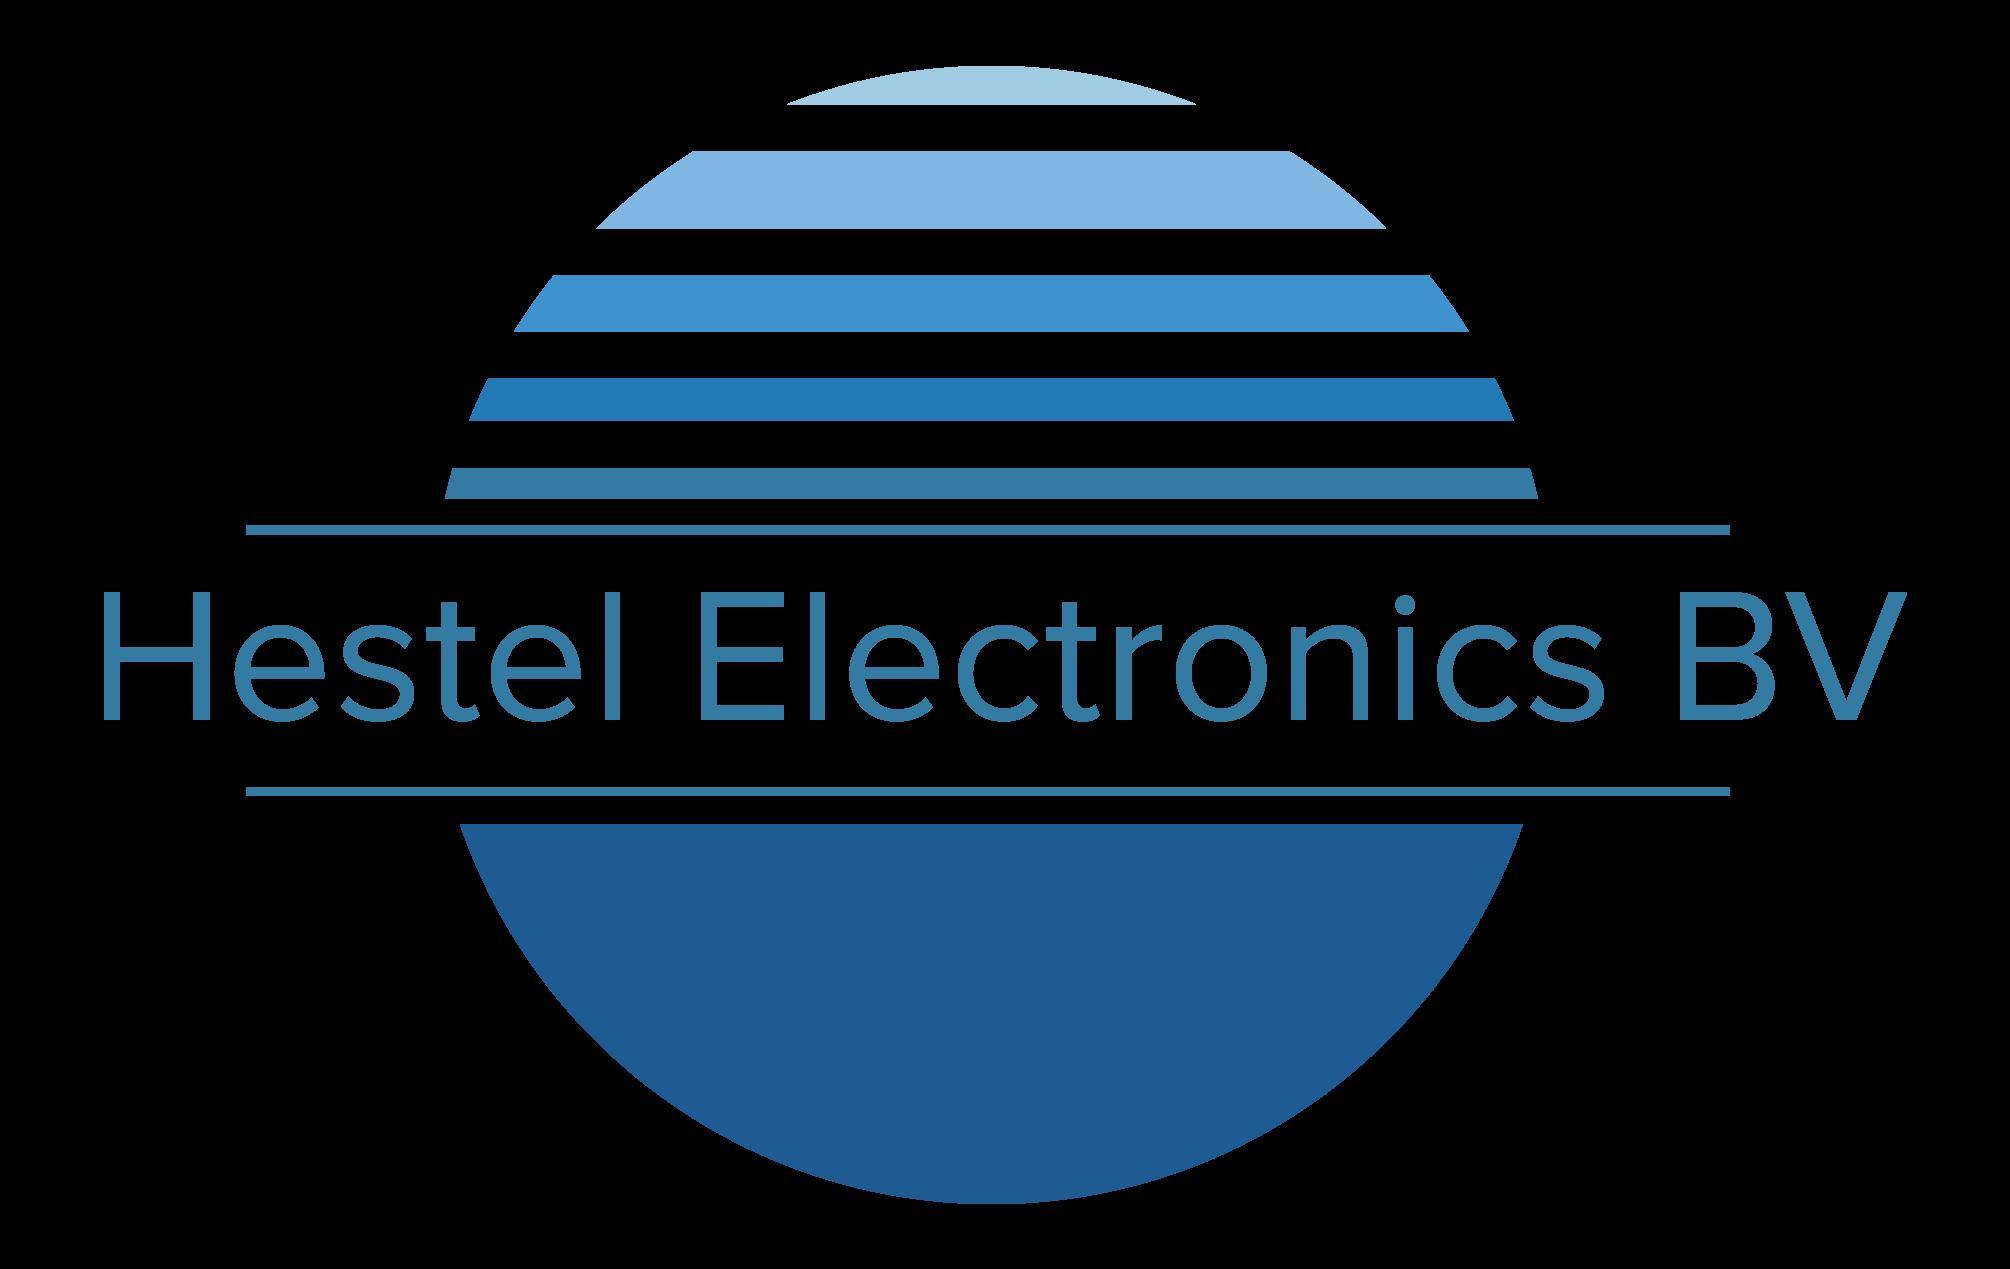 Hestel Electronics BV